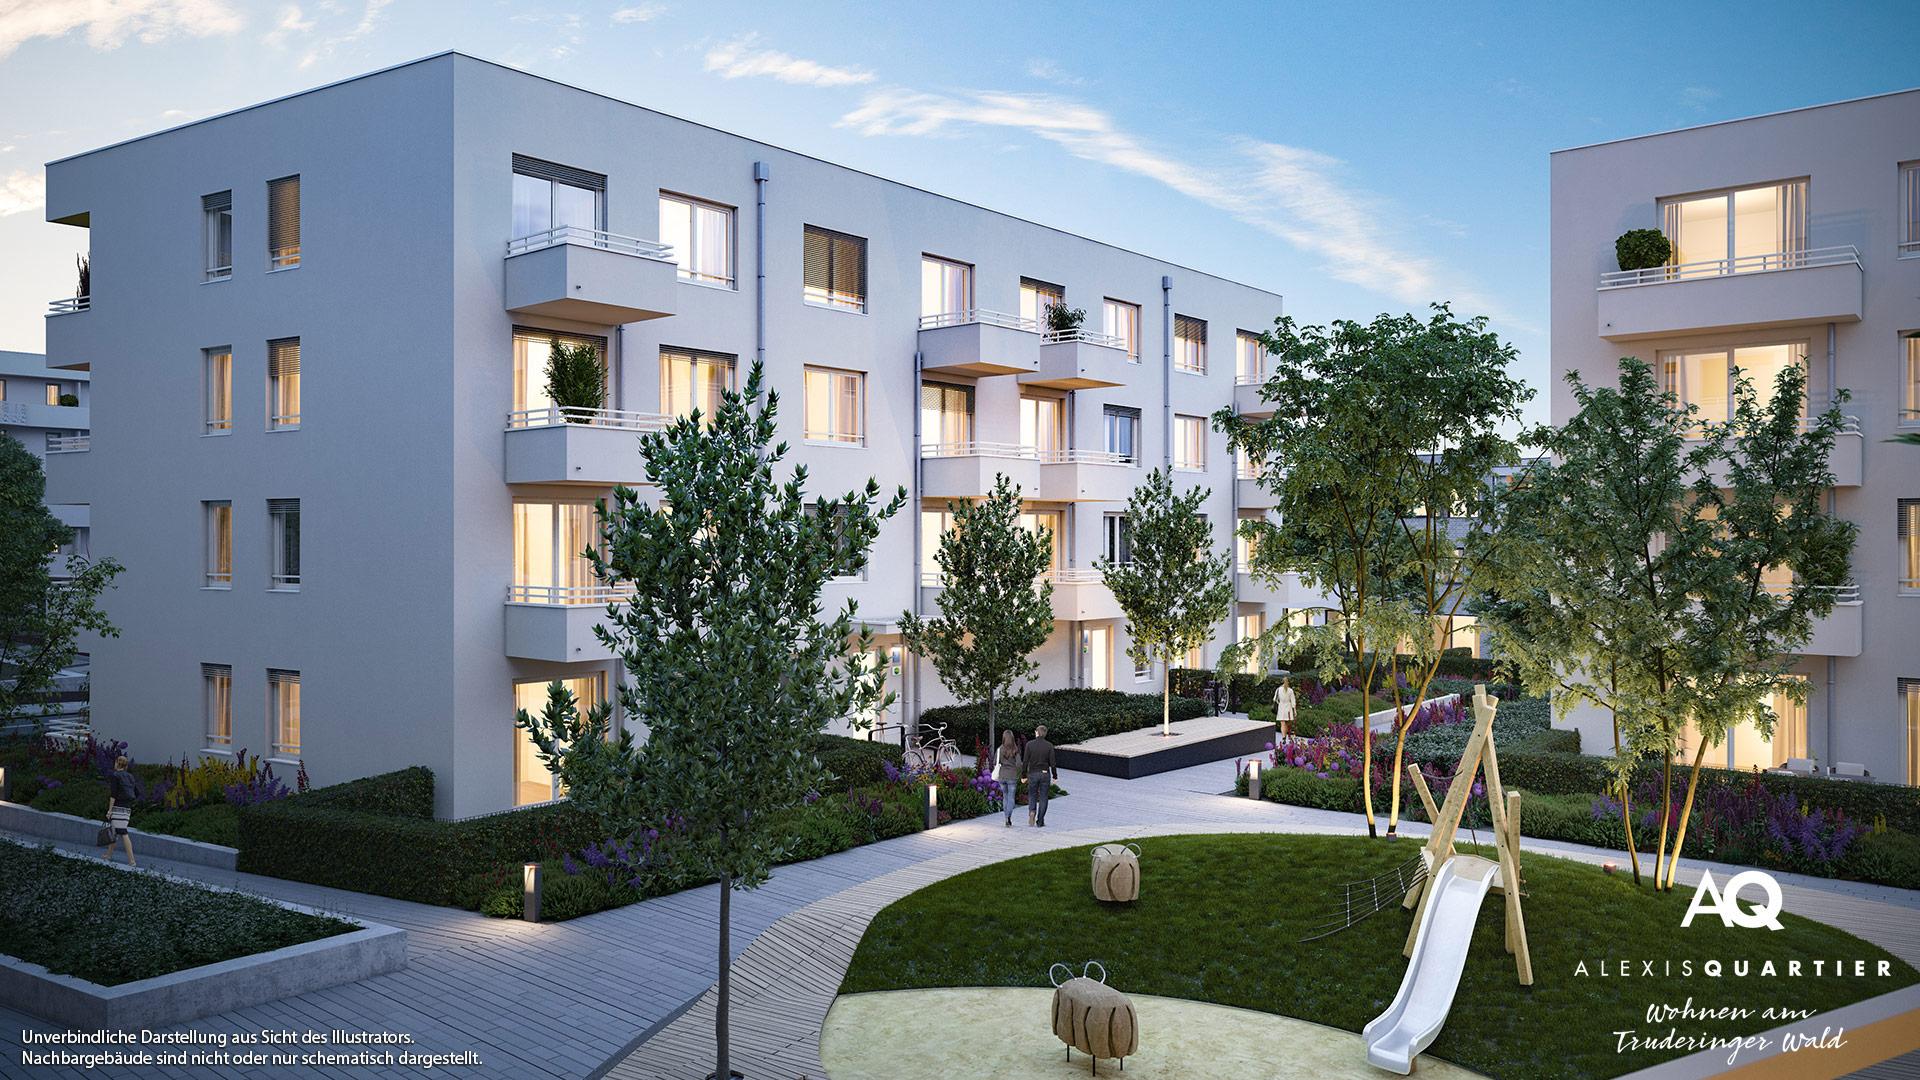 Immobilie Alexisquartier - Wohnen am Truderinger Wald - Illustration 7